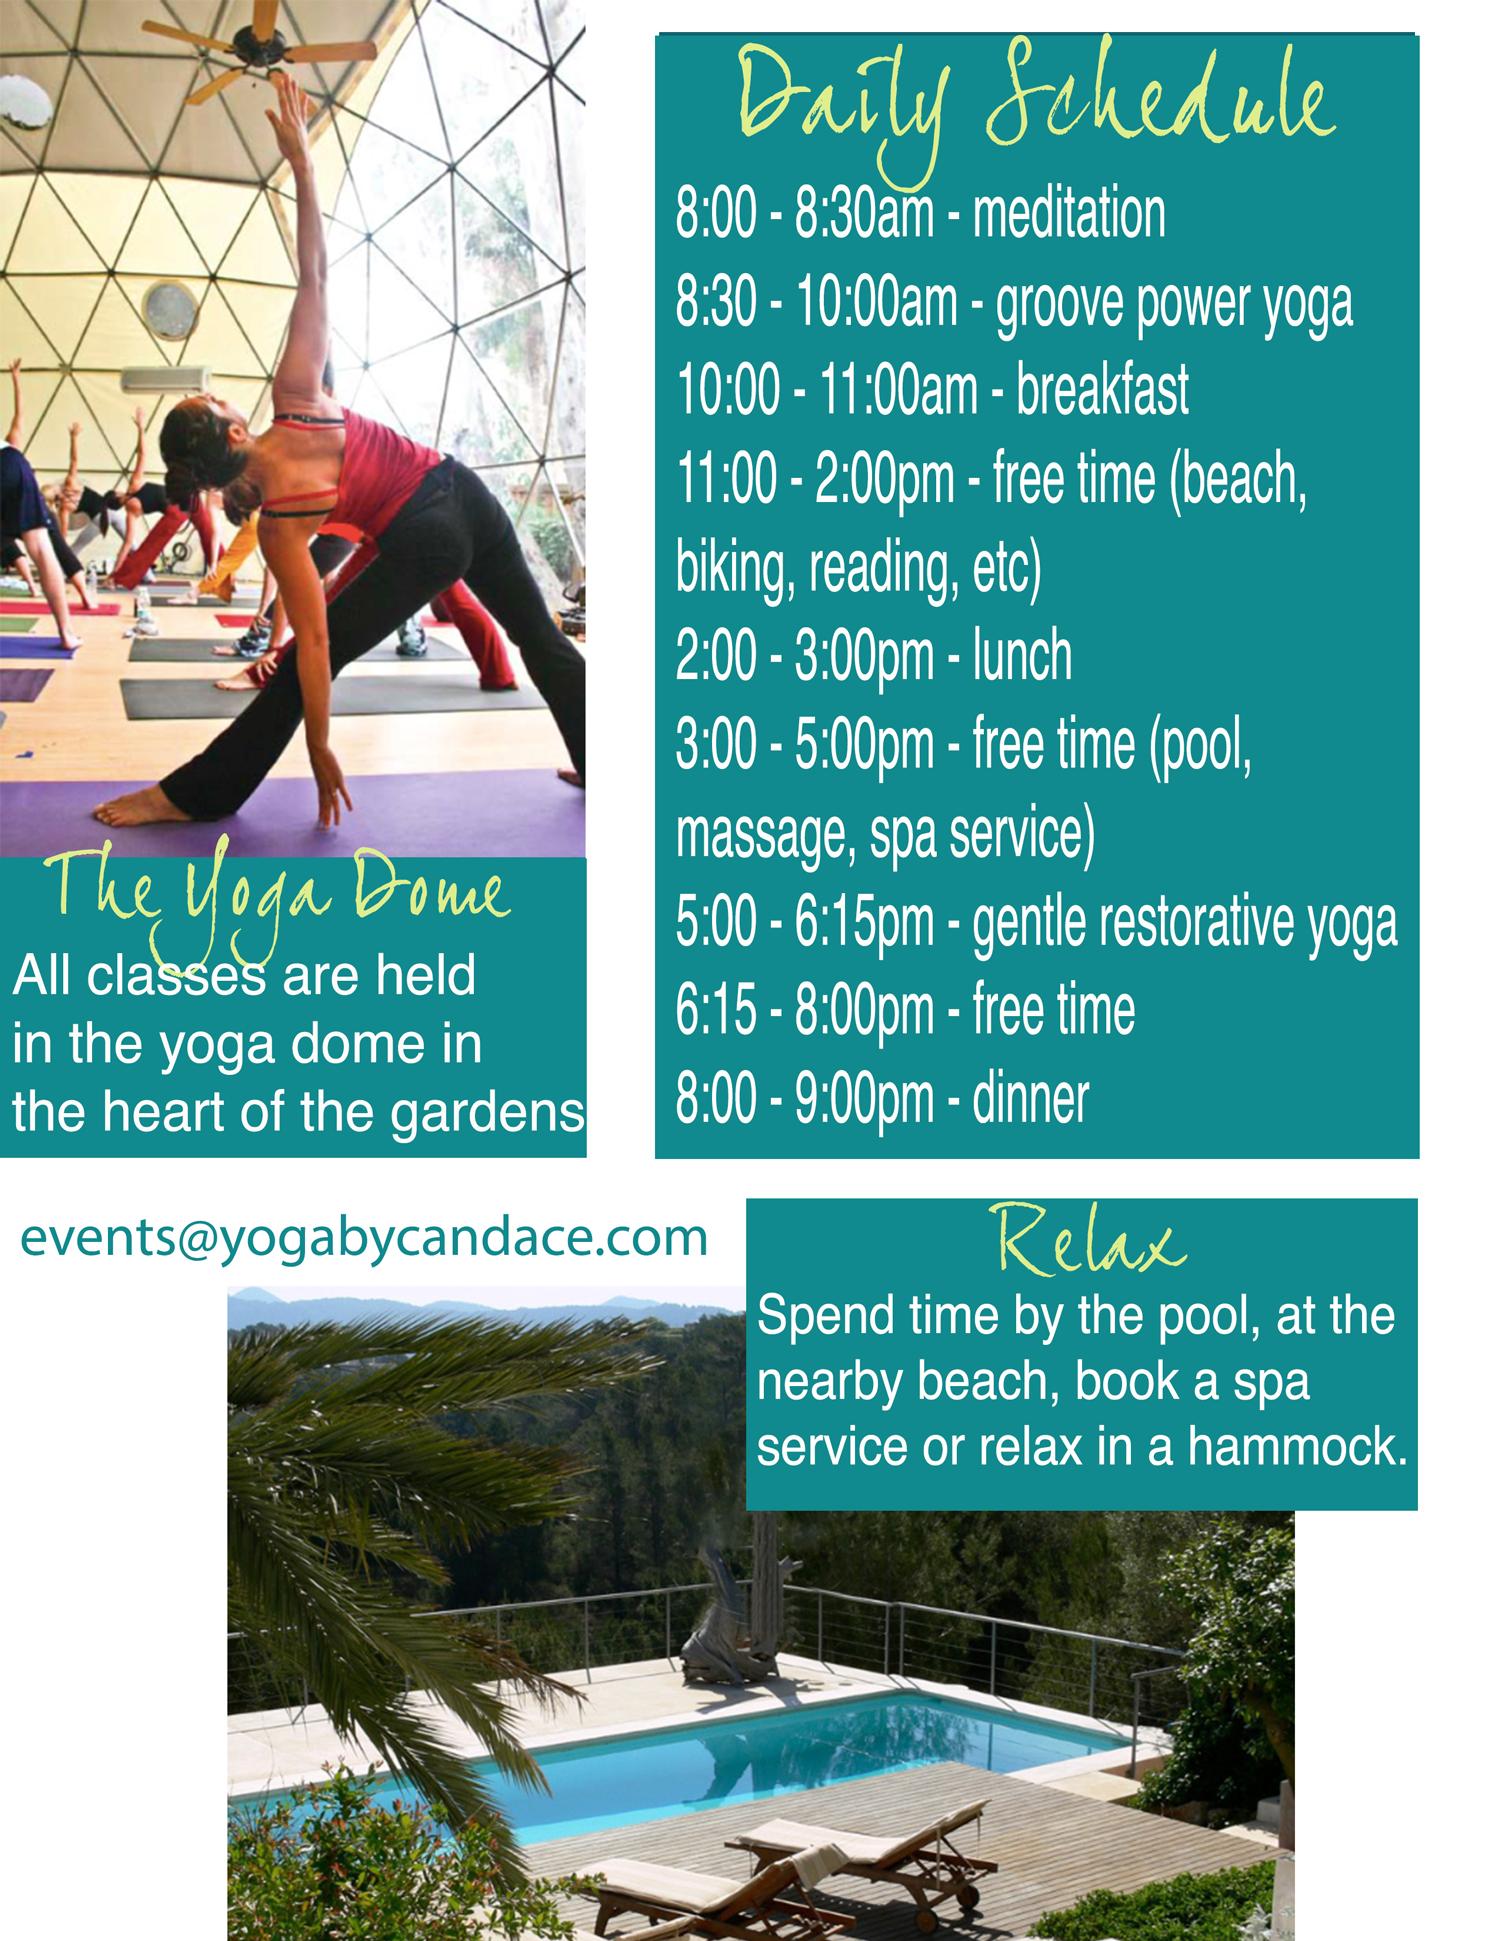 Sample day at the yoga retreat in Ibiza